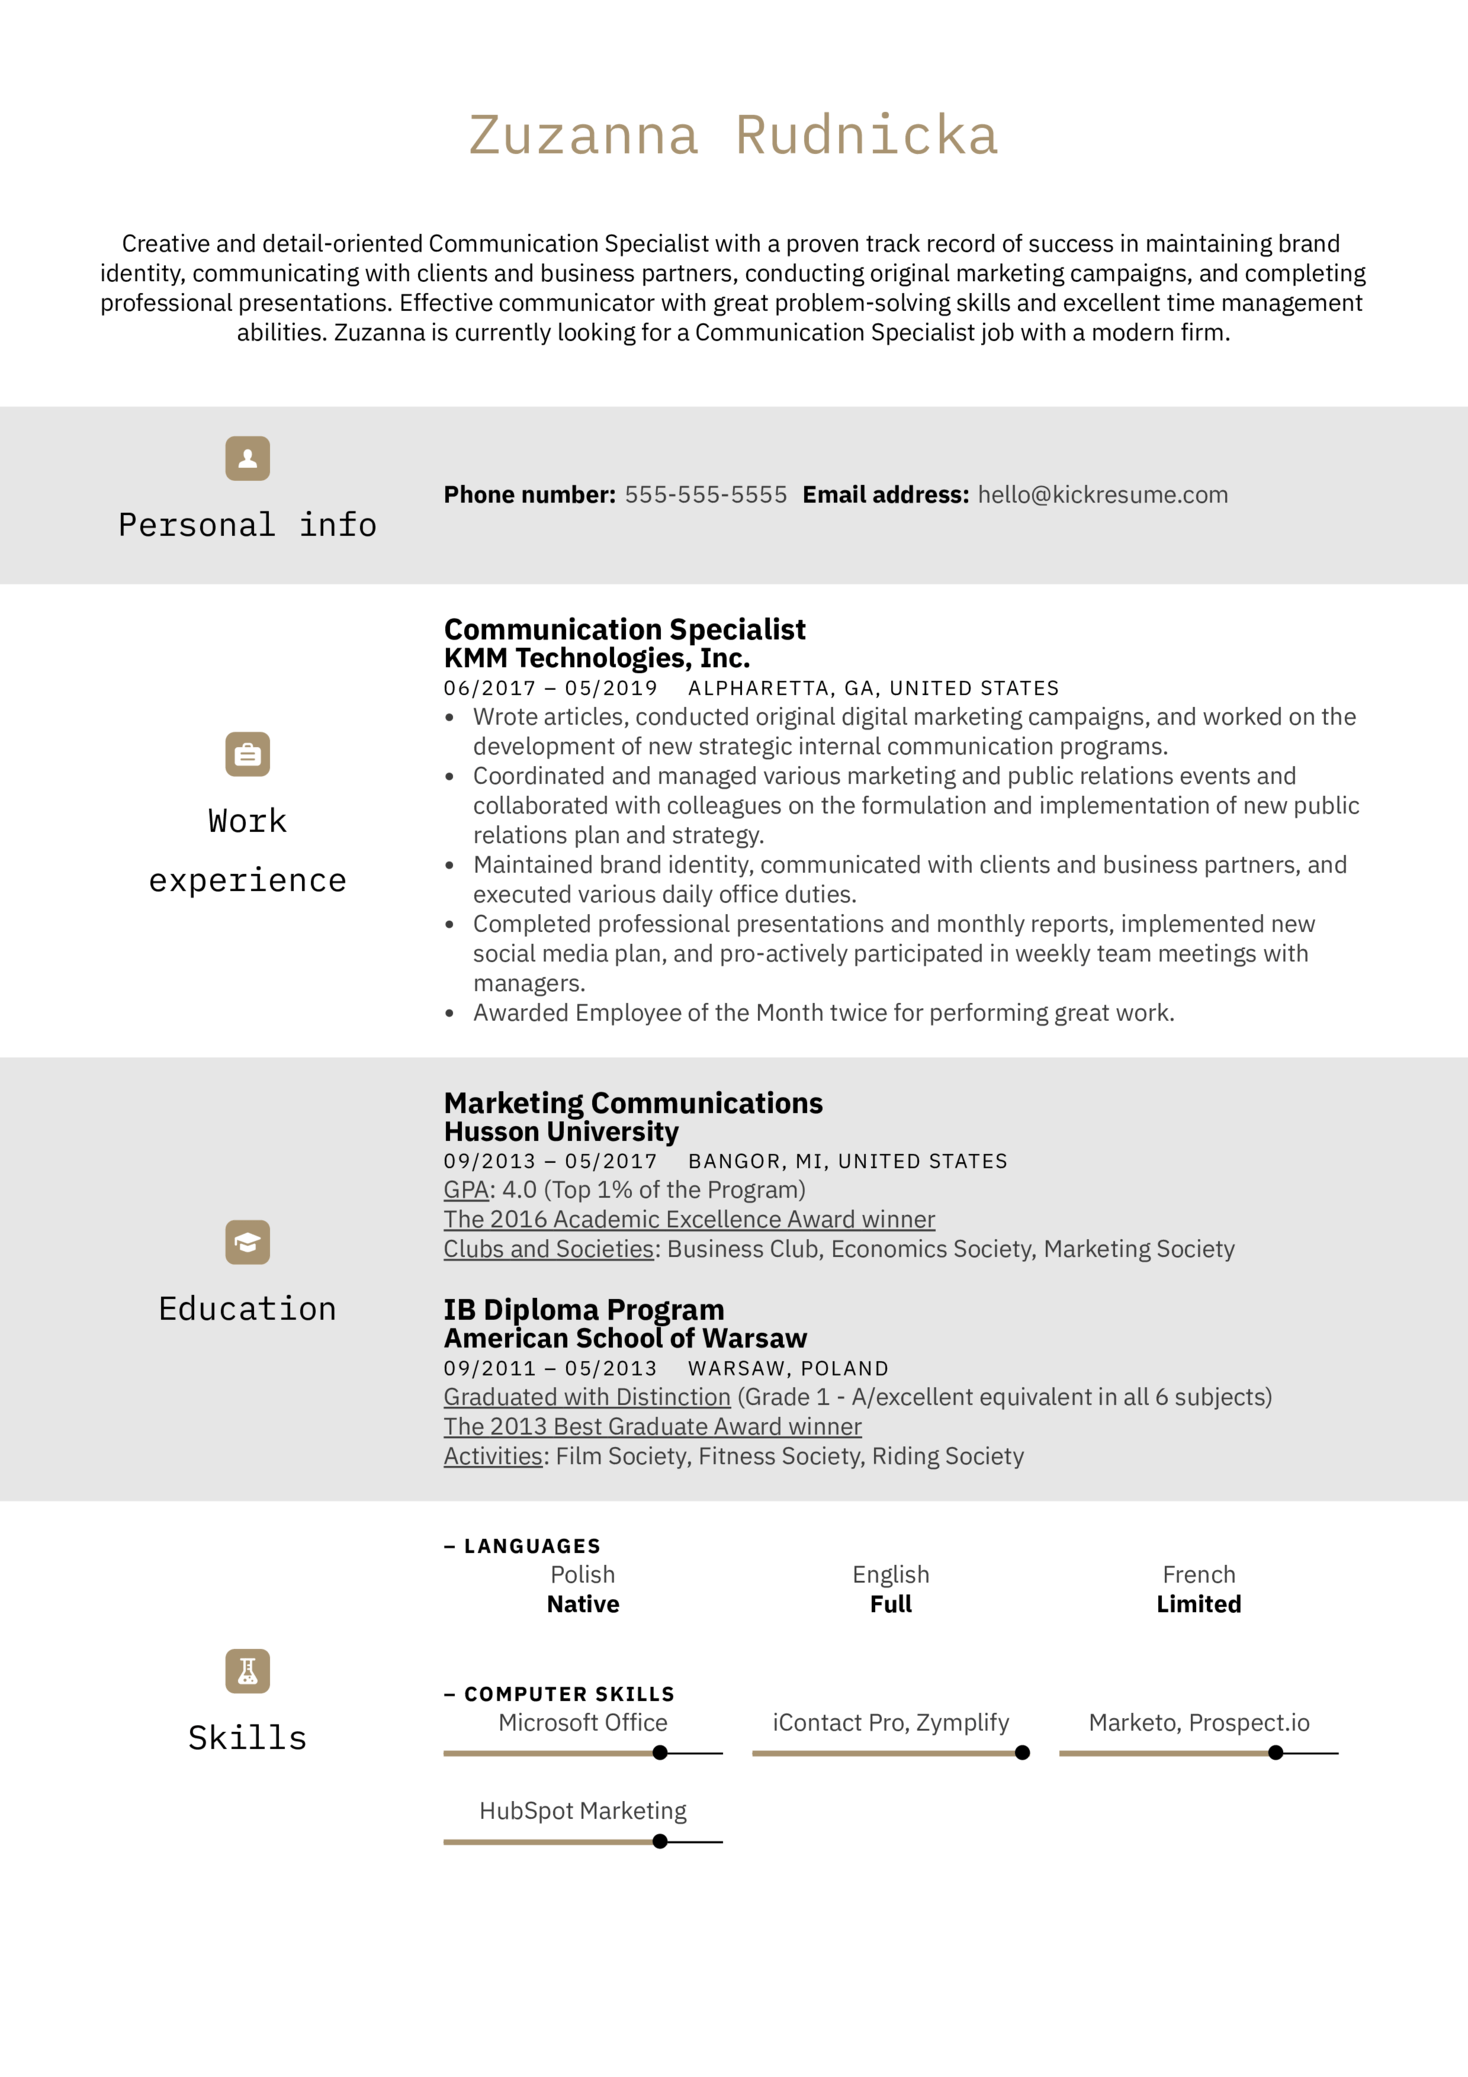 Communication Specialist Resume Sample (Parte 1)